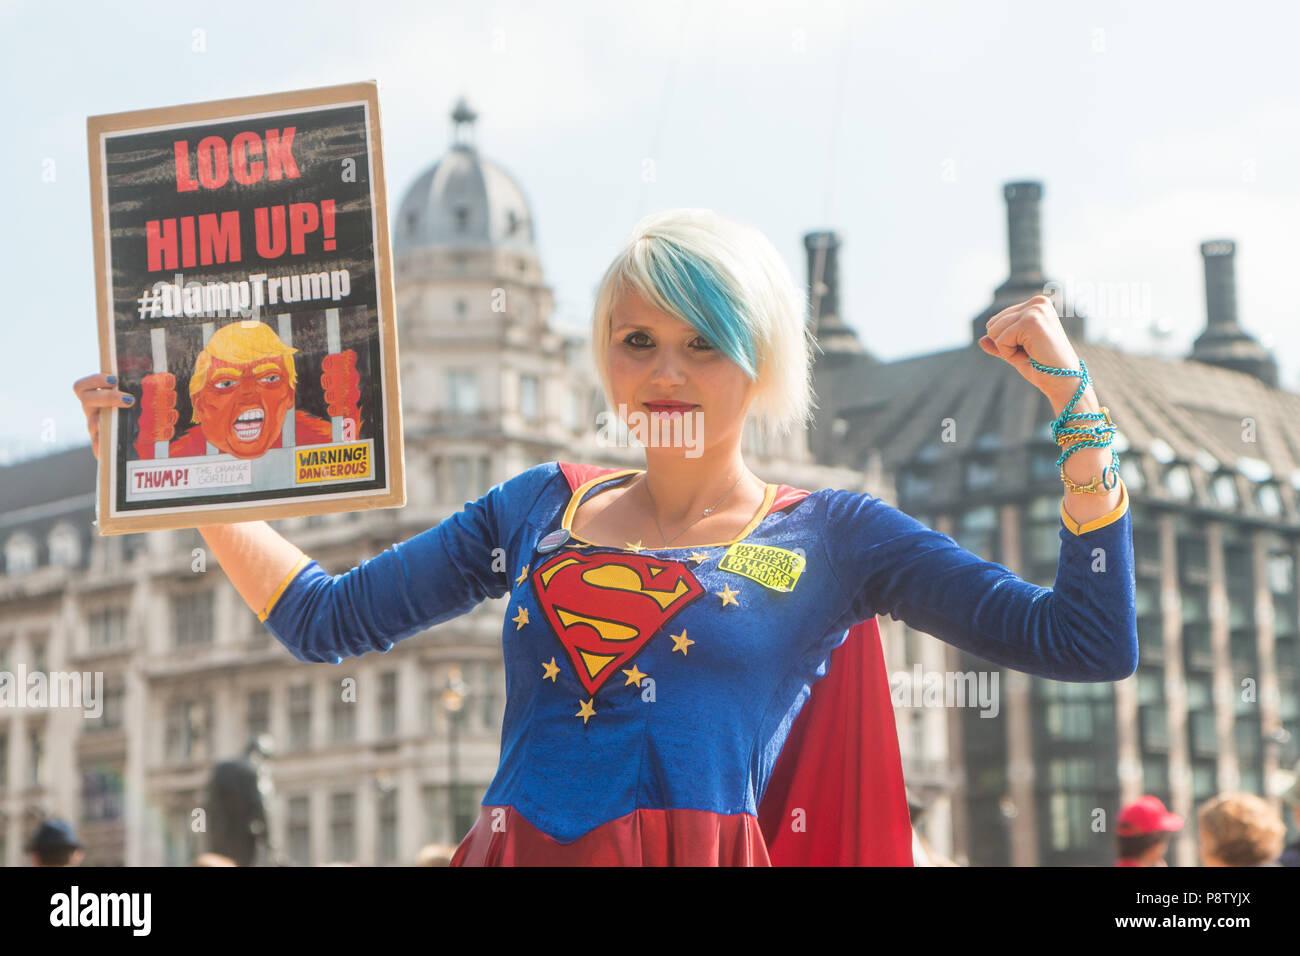 London, UK. 13th July, 2018. 'EU Supergirl' Madeleina Kay in Parliament Square Credit: Zefrog/Alamy Live News - Stock Image